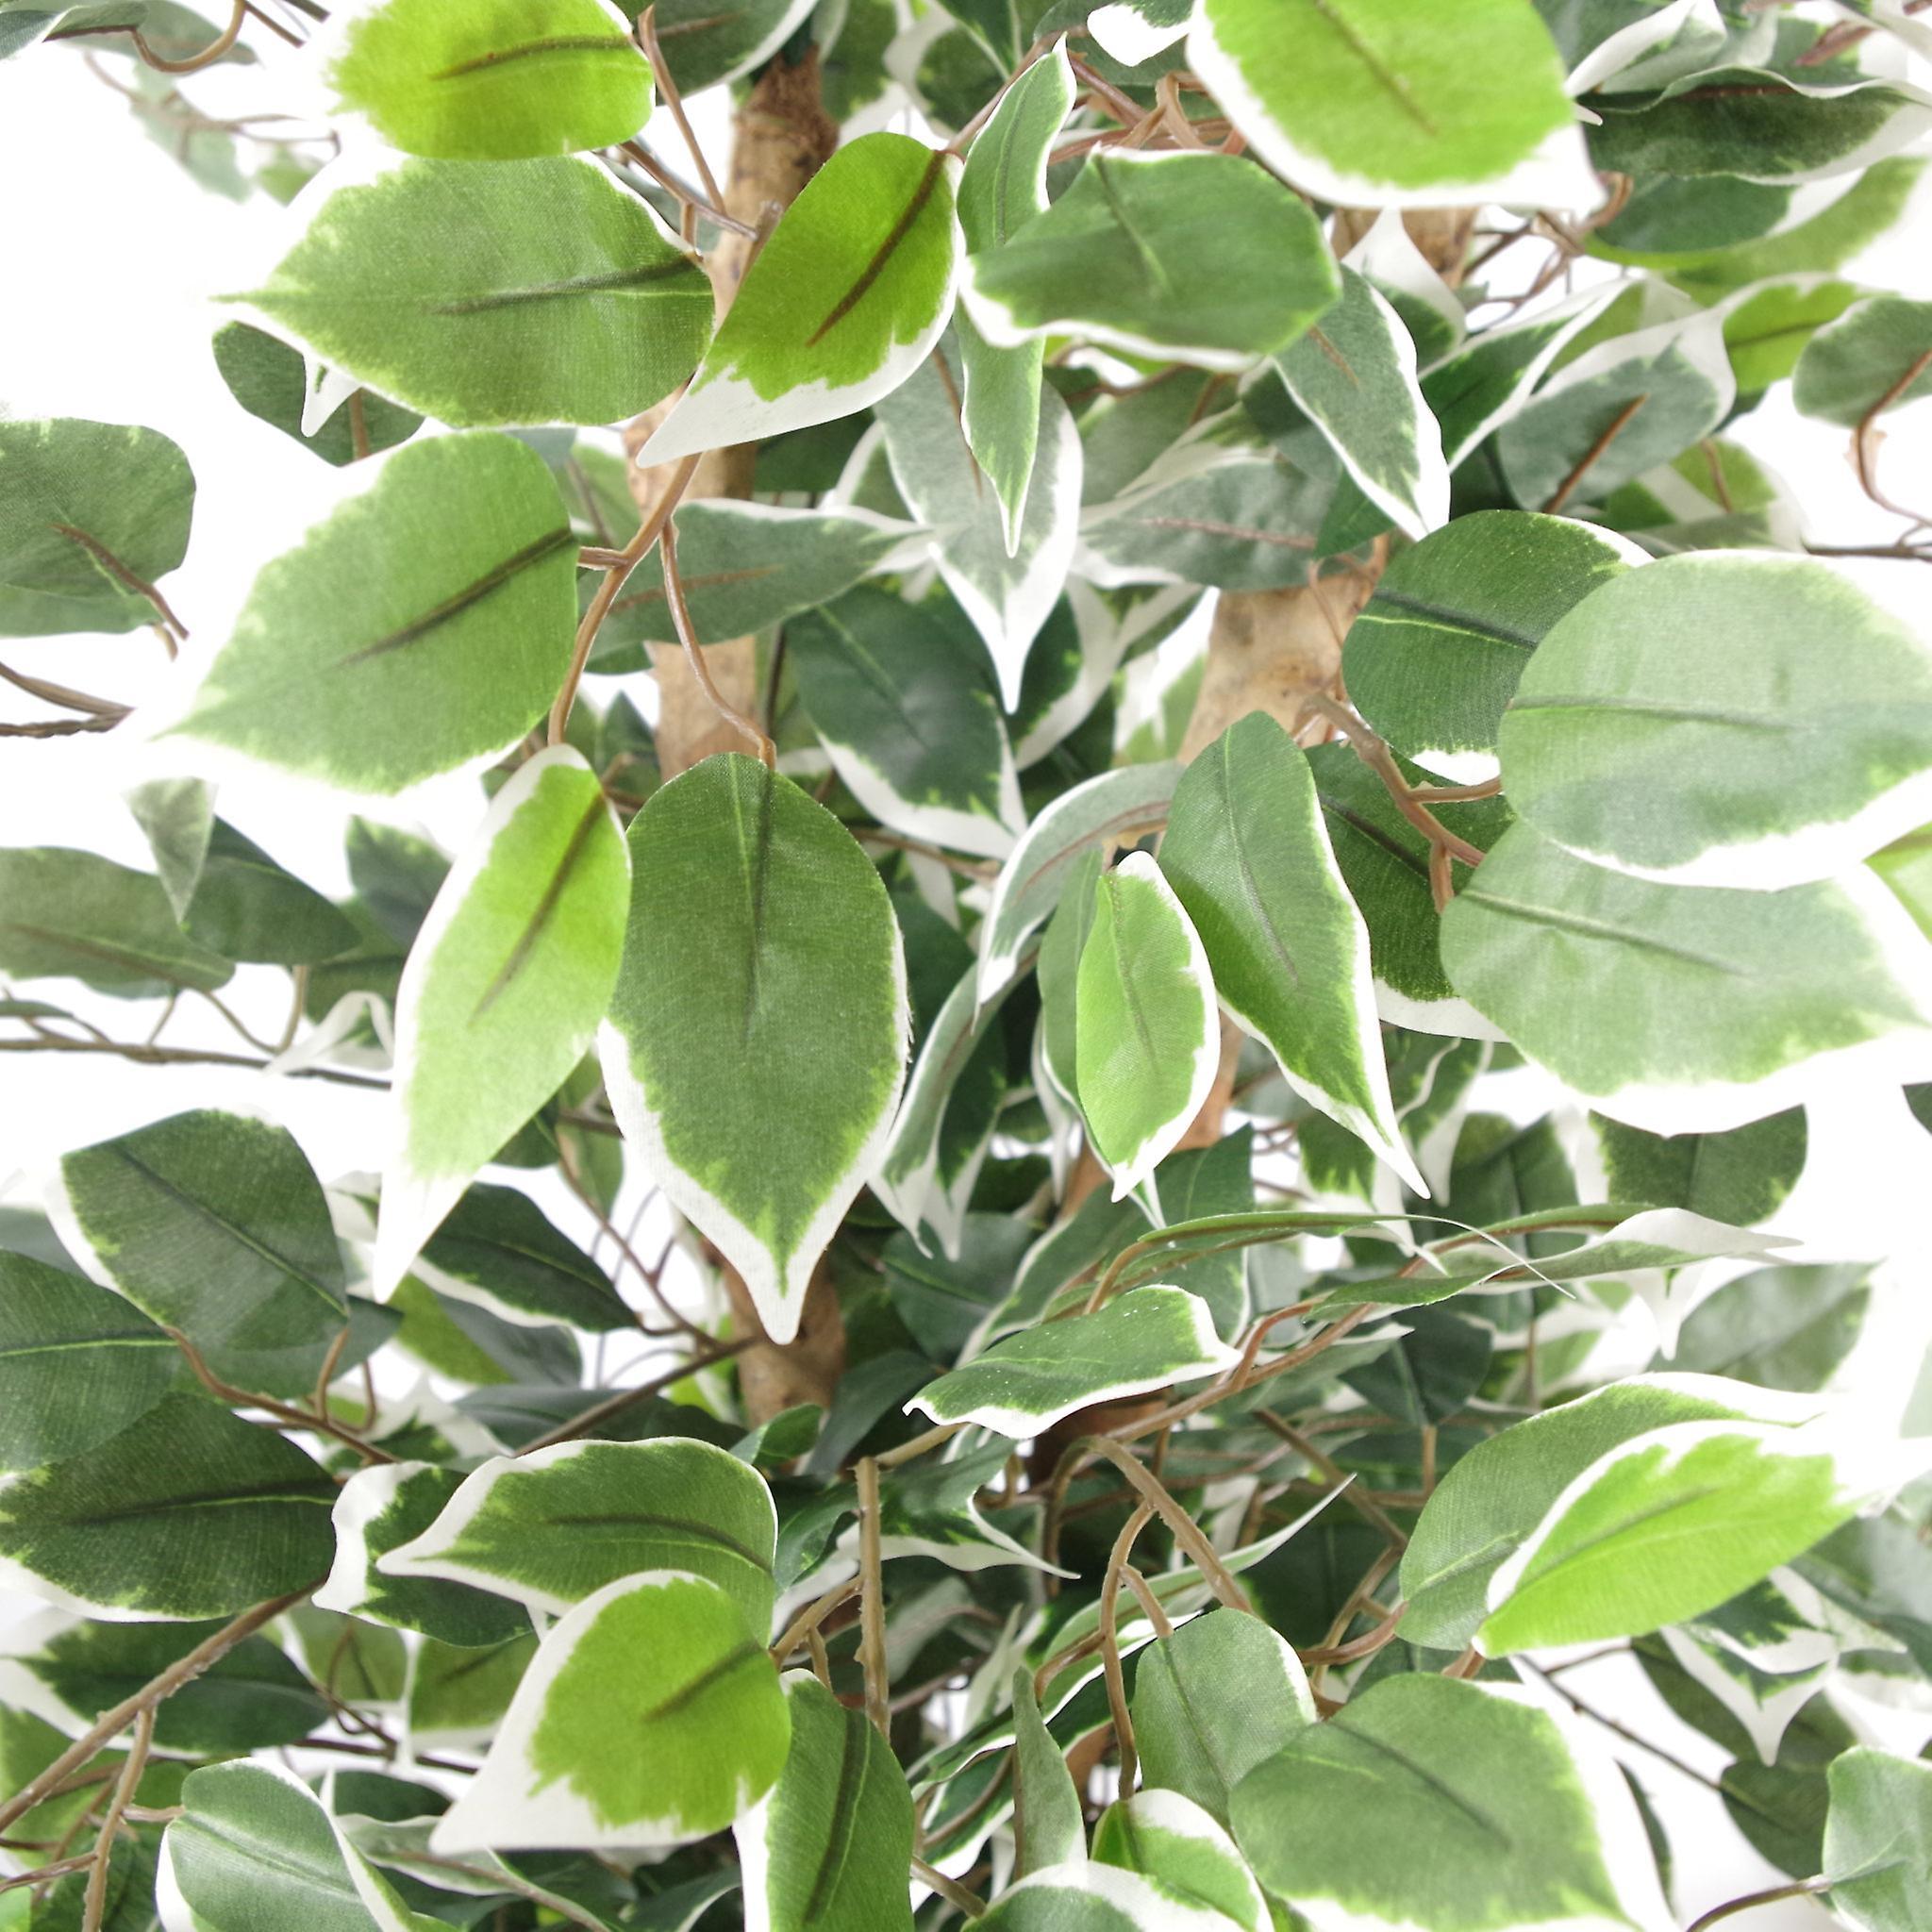 130cm Variegated White/Green Bushy Ficus Tree